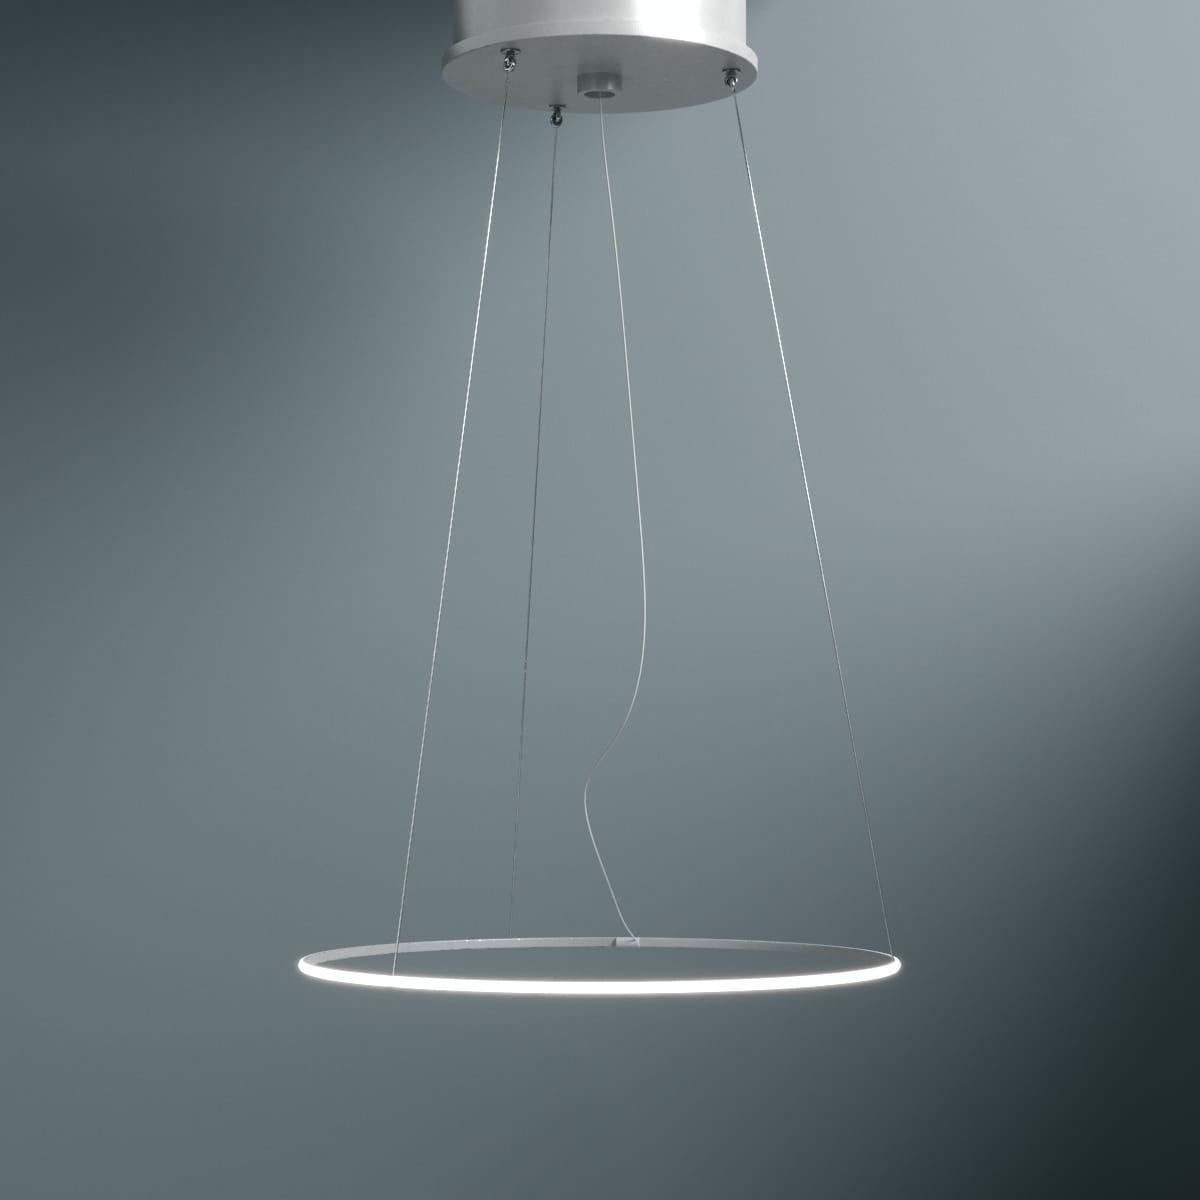 lamp 37 AM247